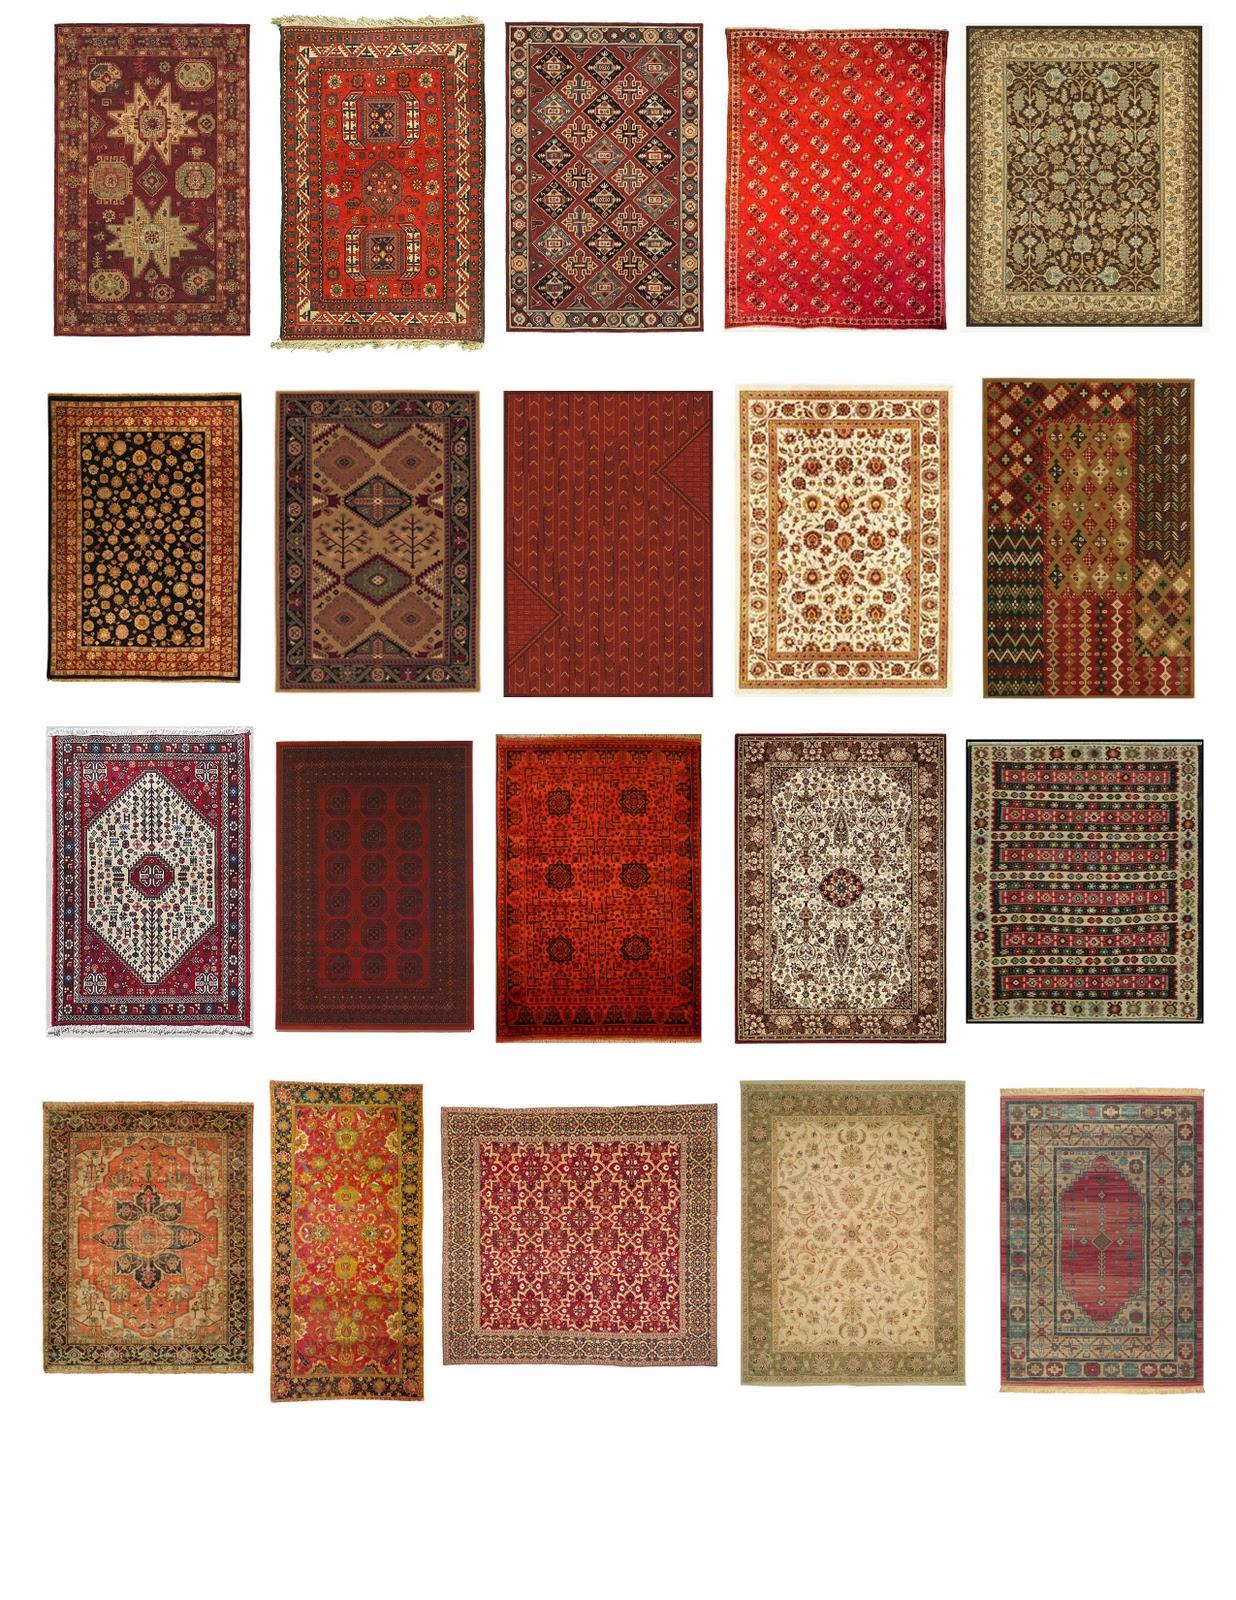 adventures in lead: genuine indostani rug sale!!